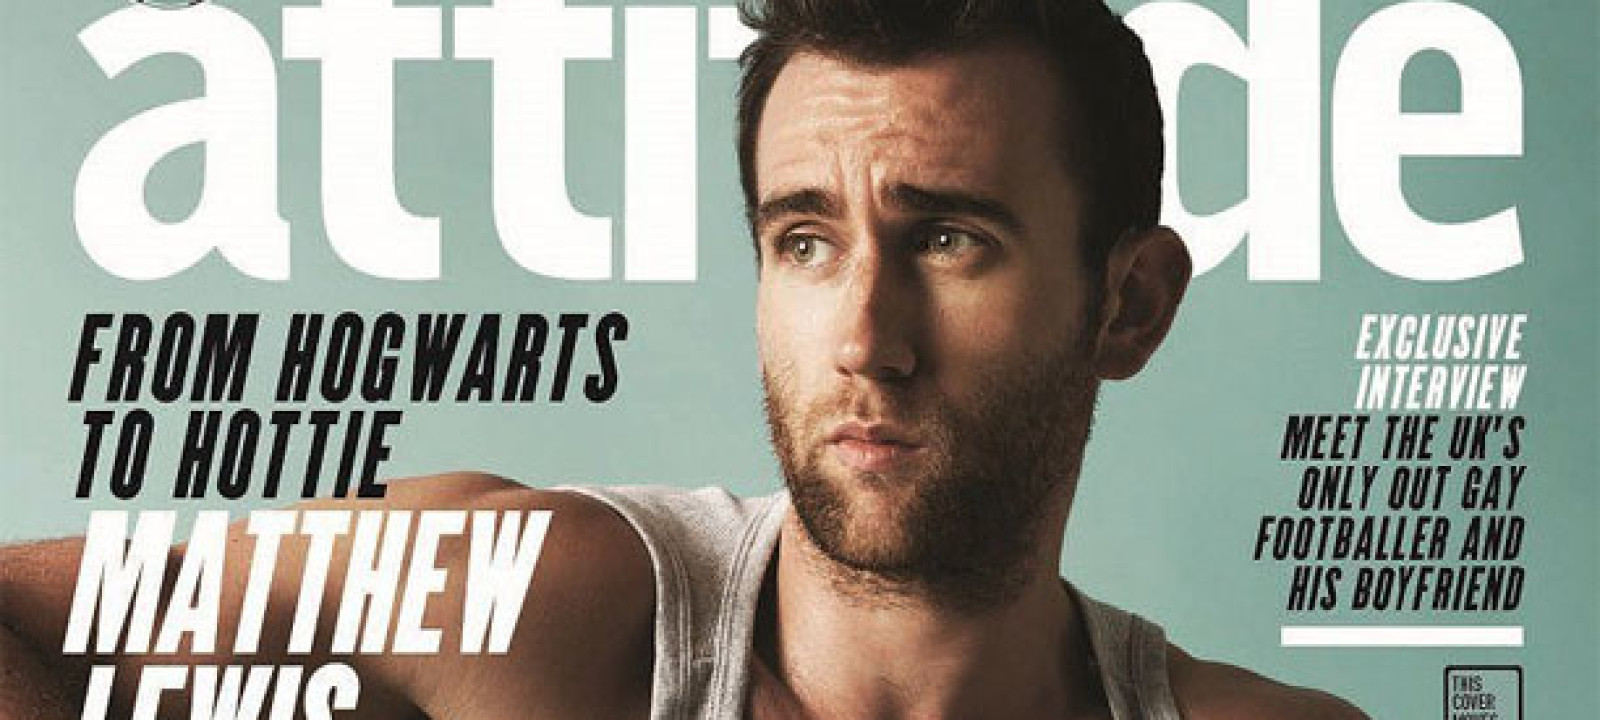 Matthew Lewis on the cover of Attitude Magazine (Pic: Attitude Media Ltd)